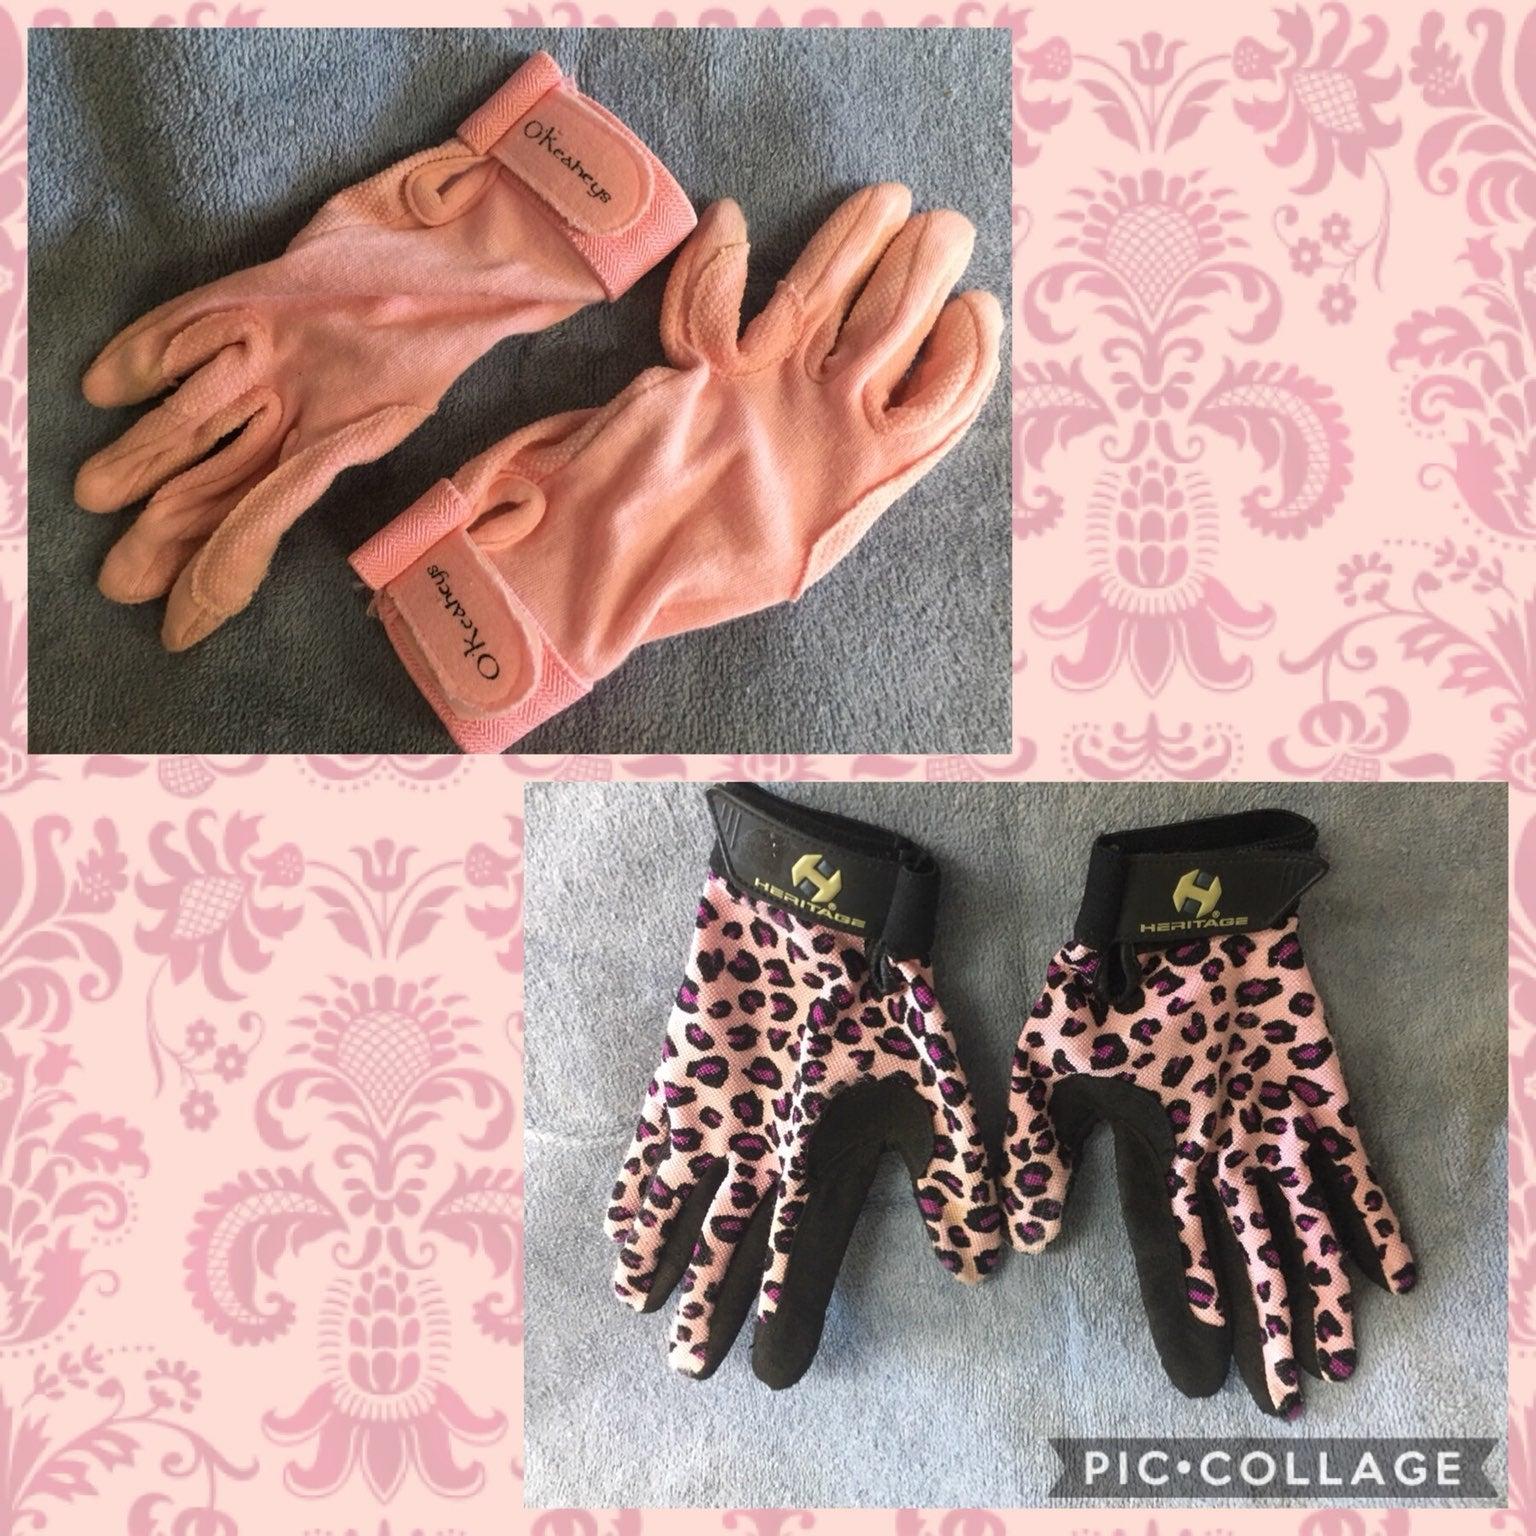 Girl's Equestrian Riding Gloves-2 Pair